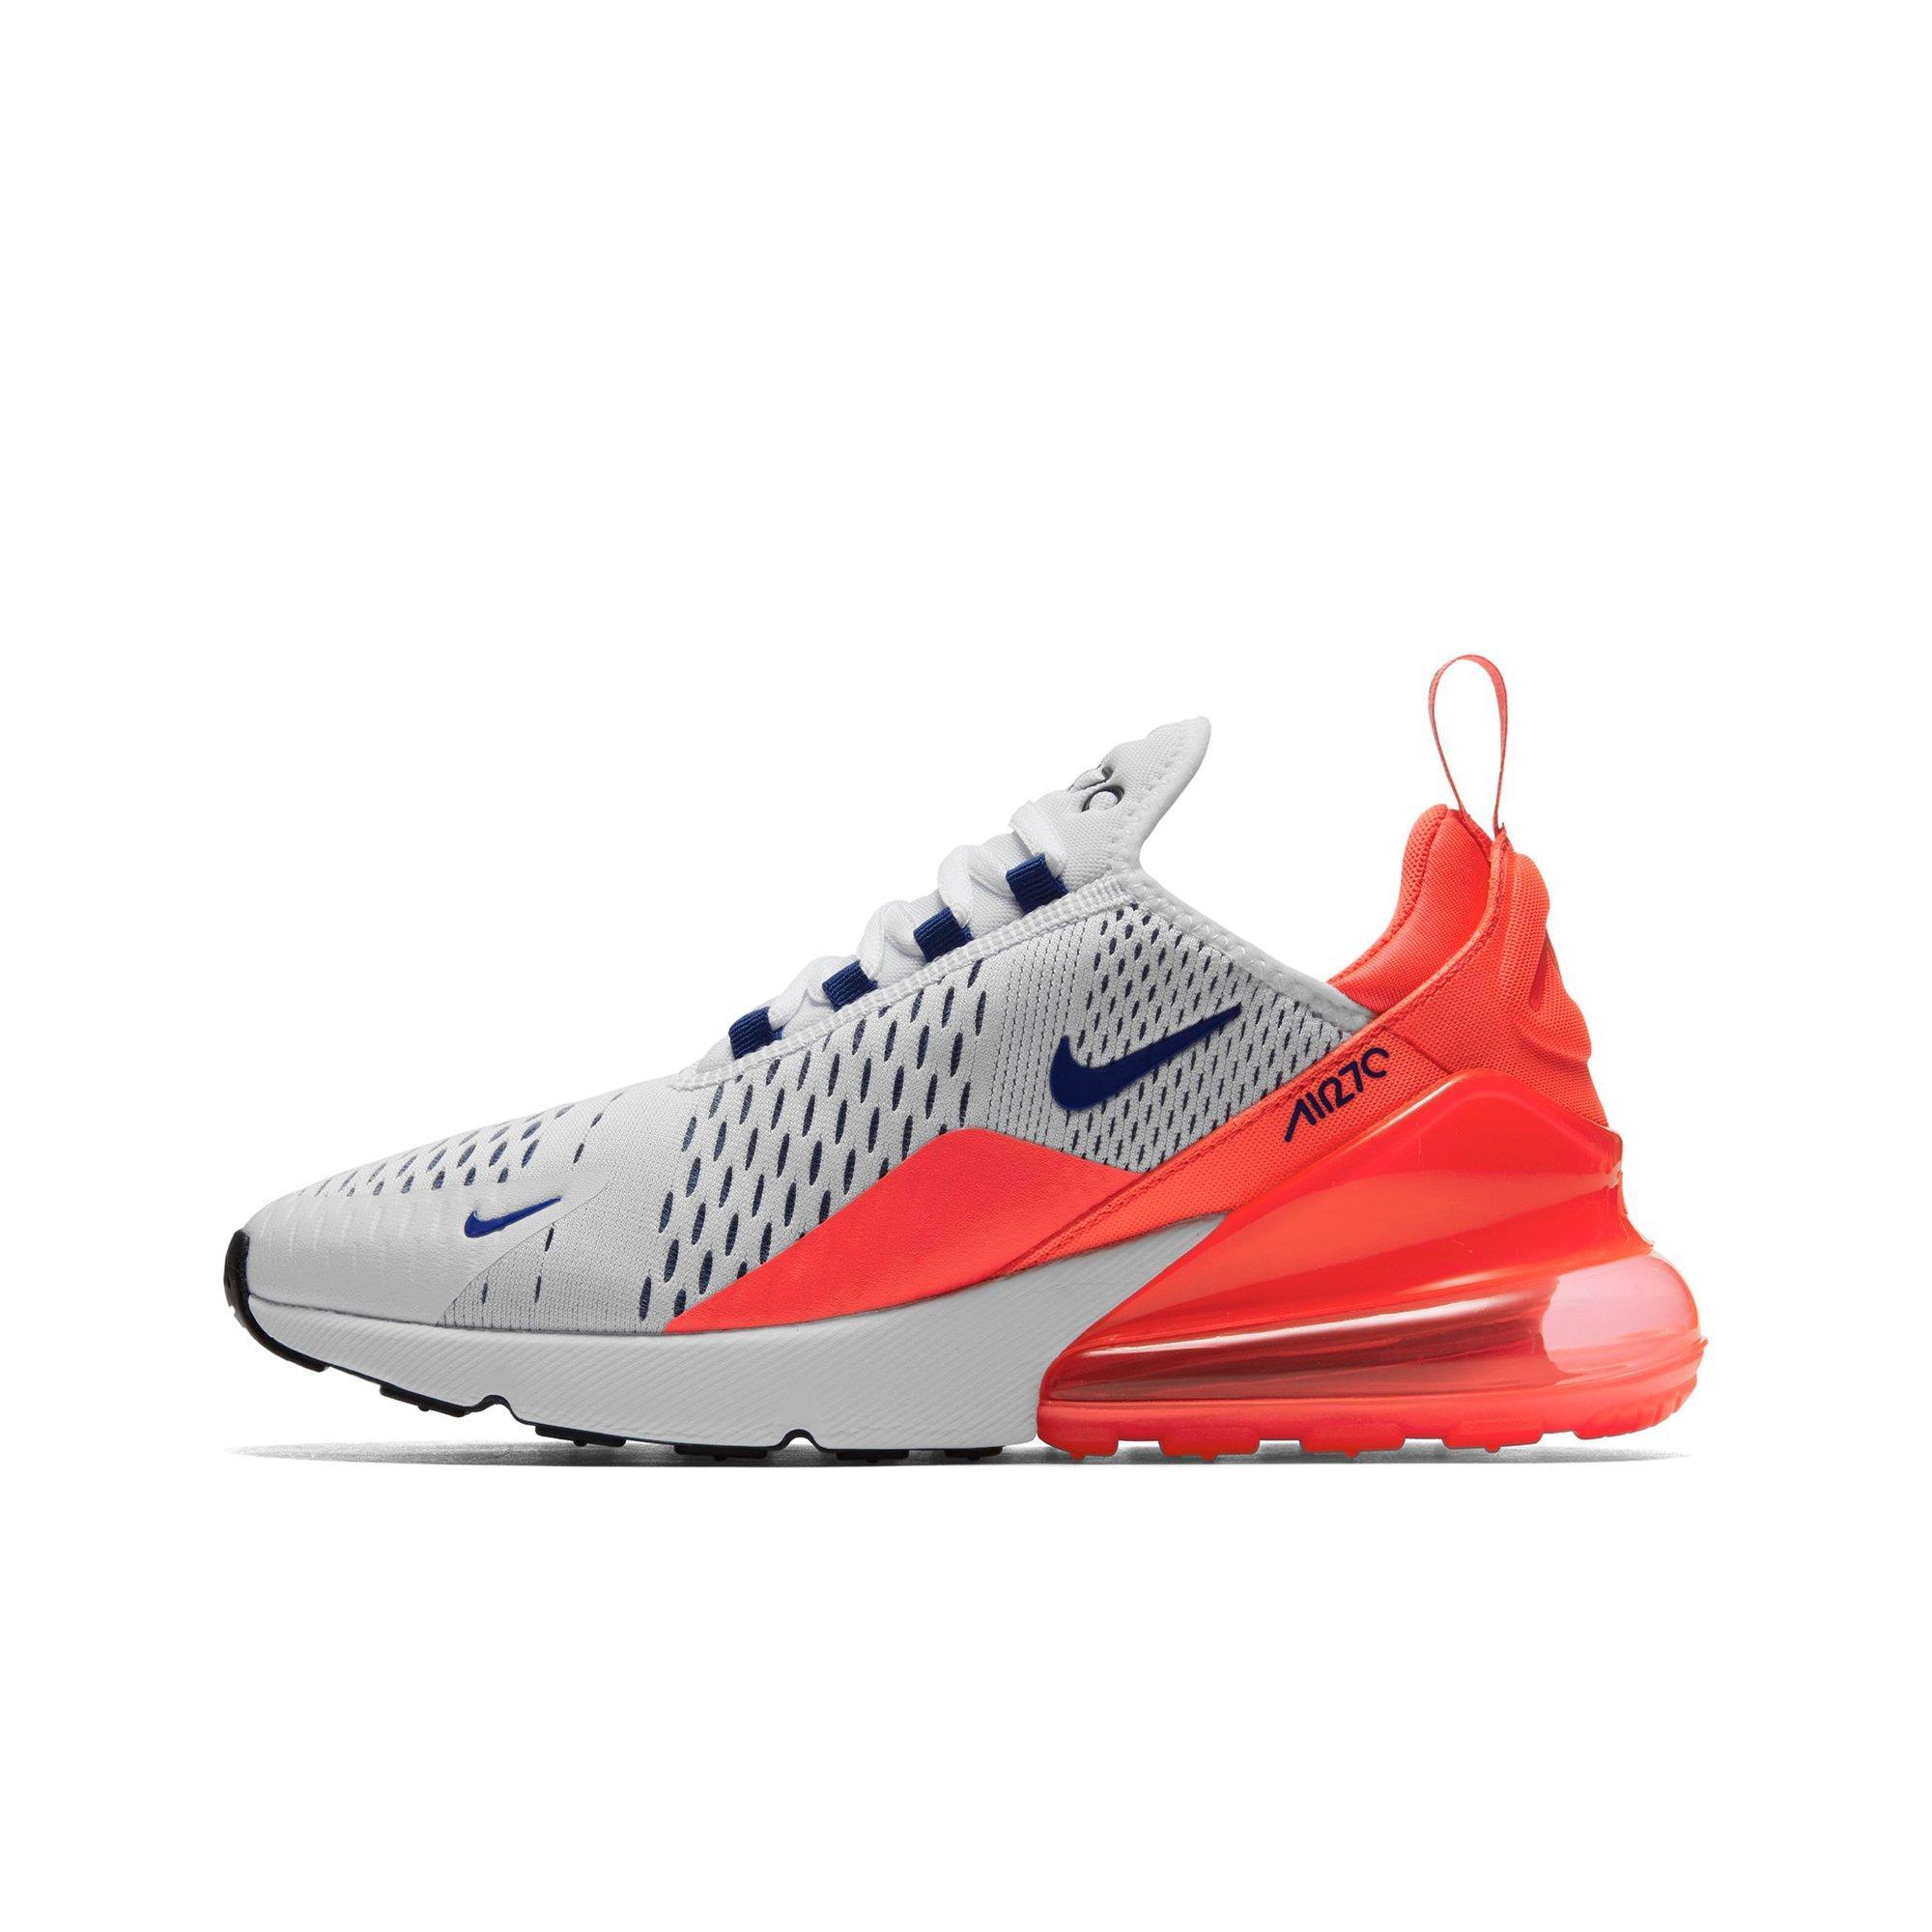 Nike Zoom Streak 4 Volt Sequoia Musée des impressionnismes Giverny